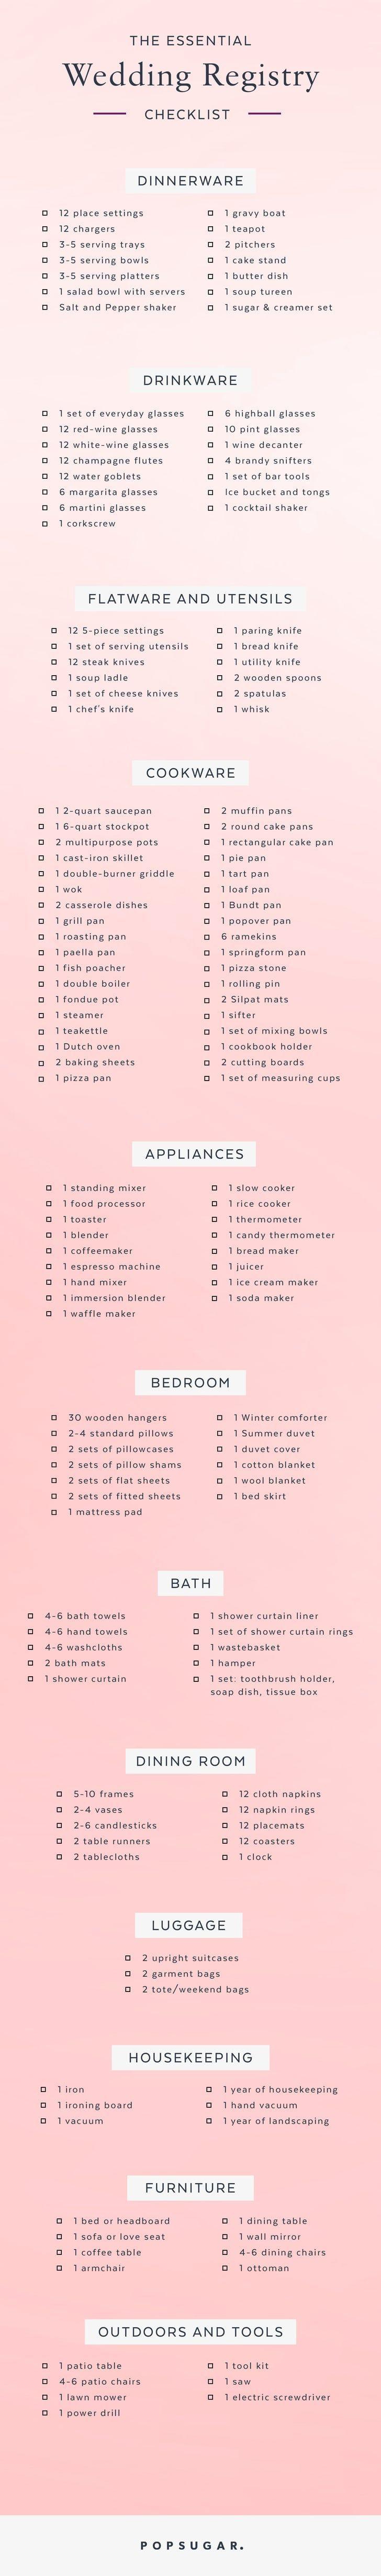 Your Essential Wedding Registry Checklist -